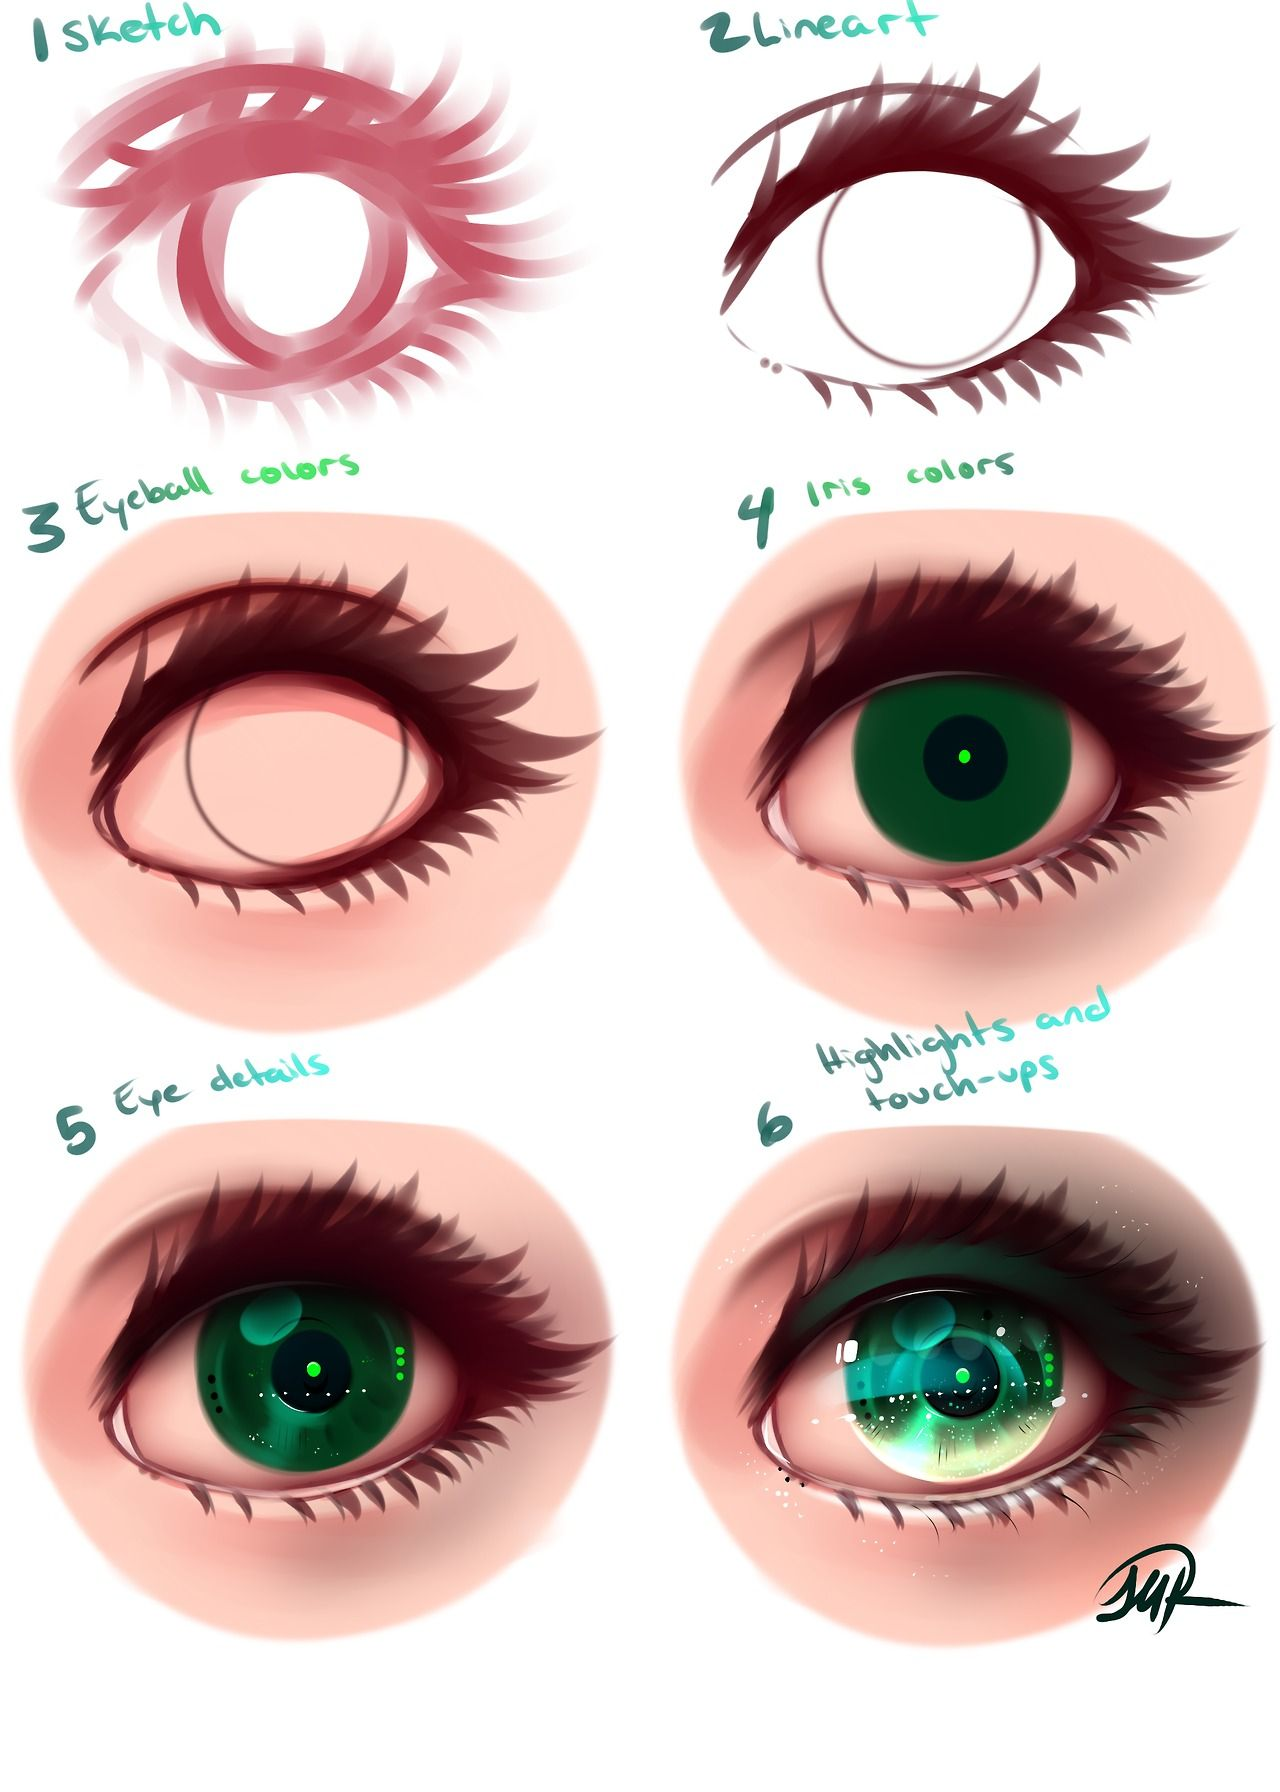 Breakingmelancholy anime art tutorial digital art